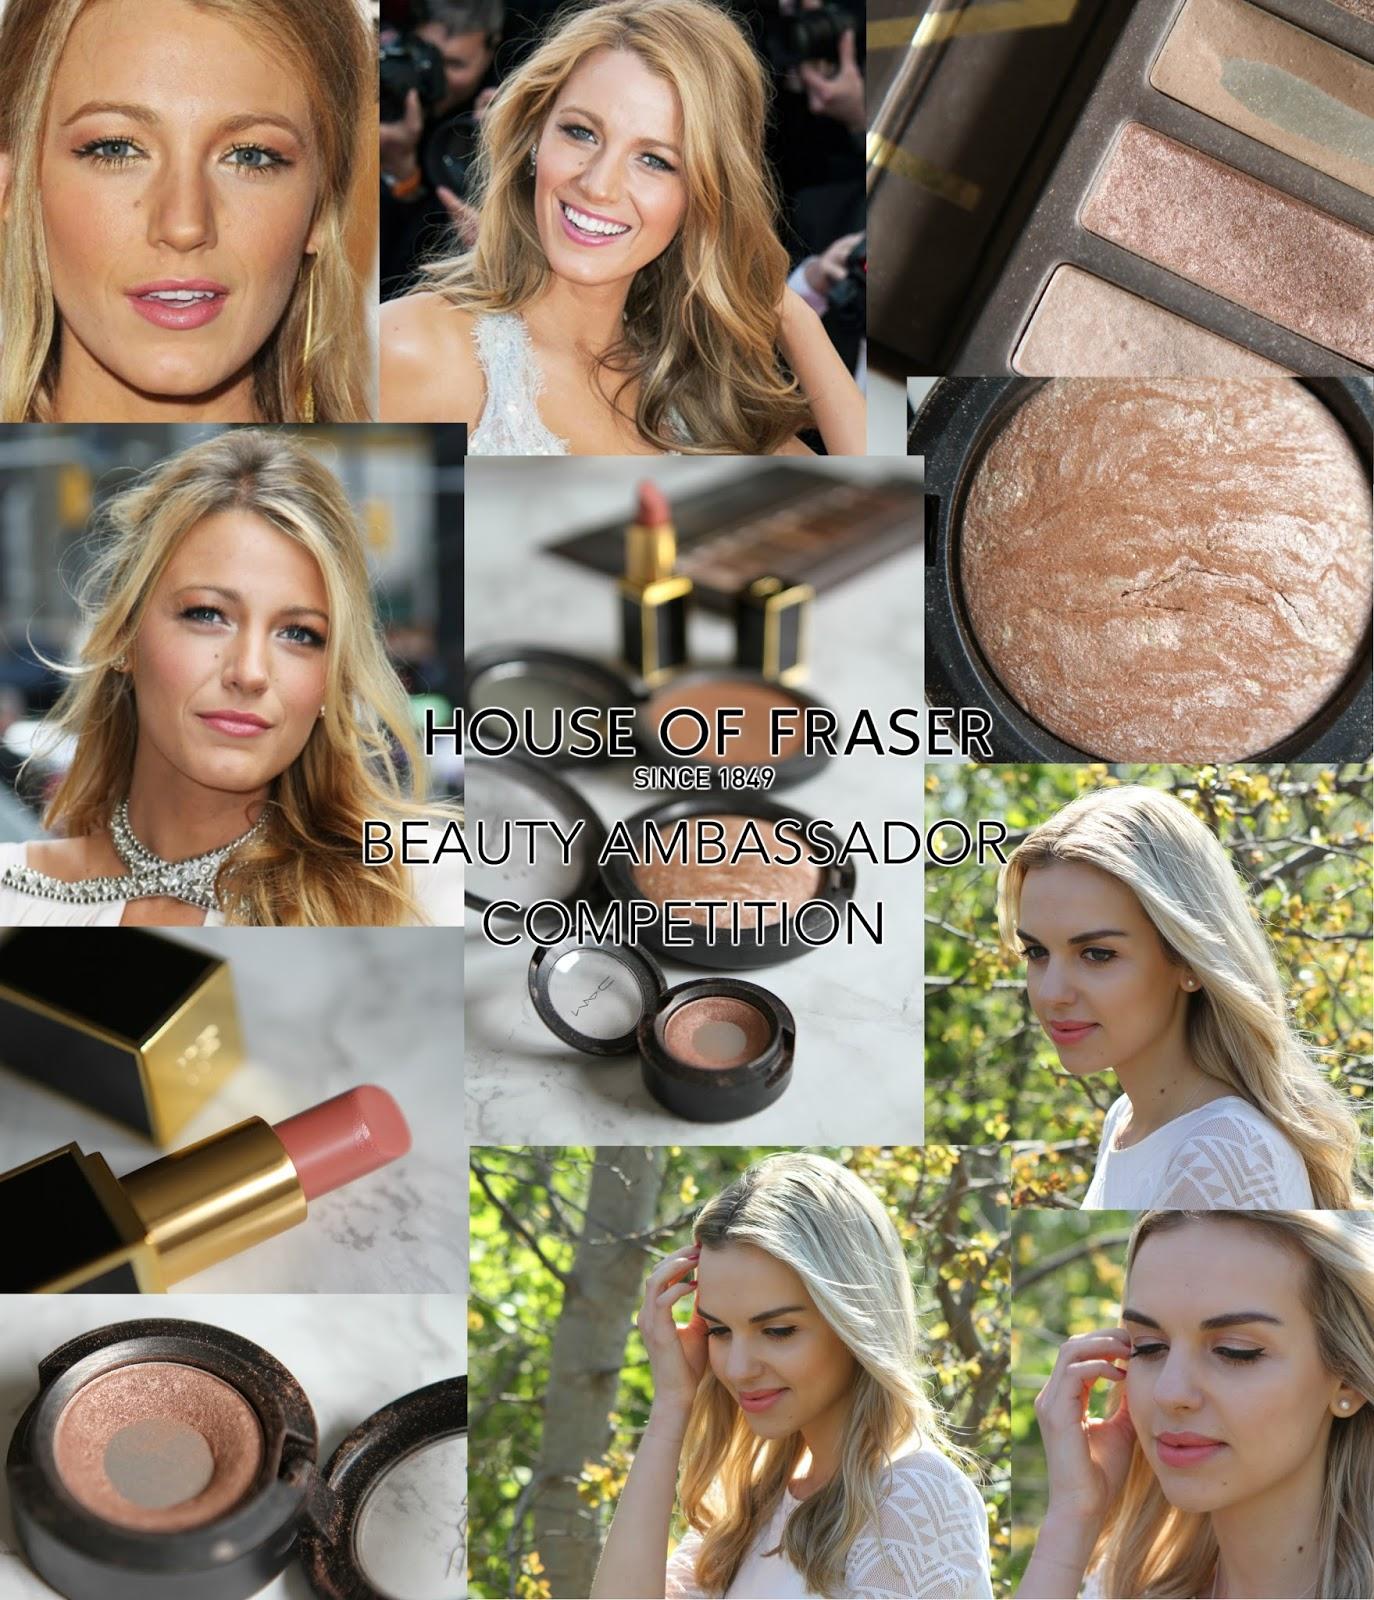 House of fraser beauty ambassador